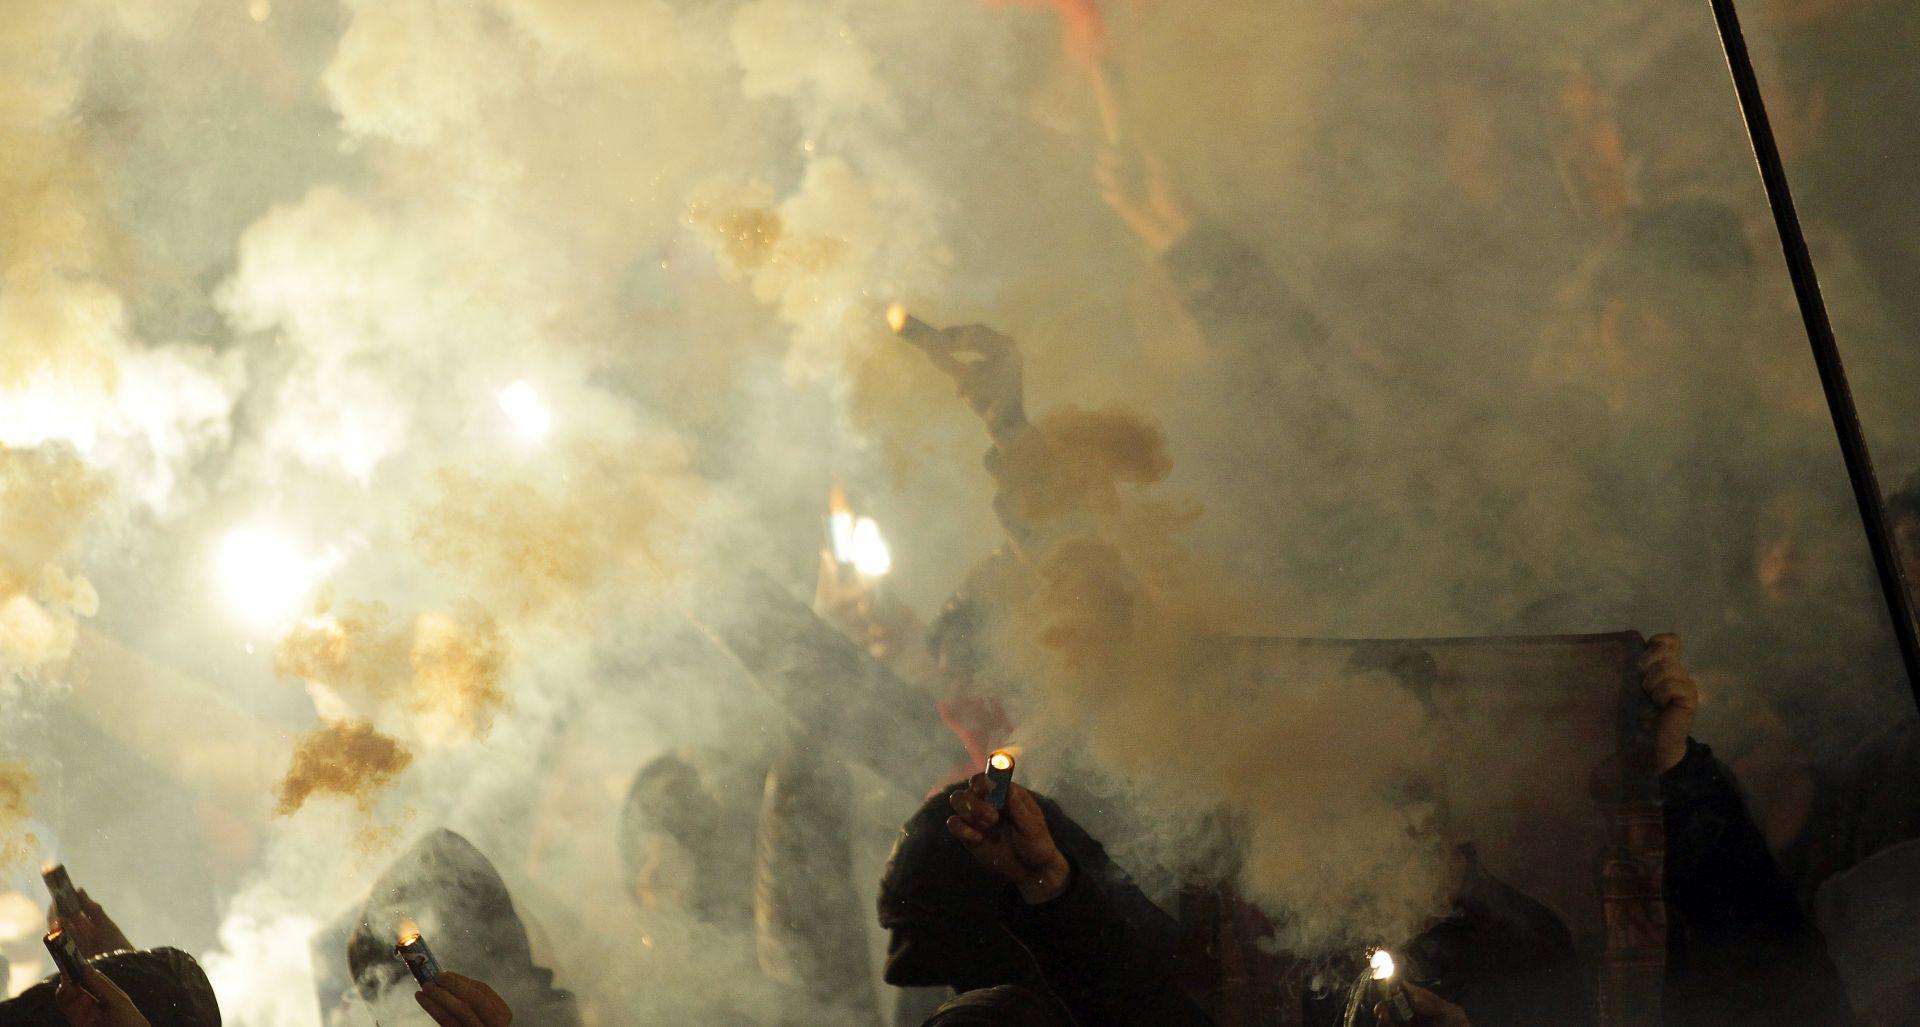 Najmlađi huligan uhićen u Beogradu vratio se kući